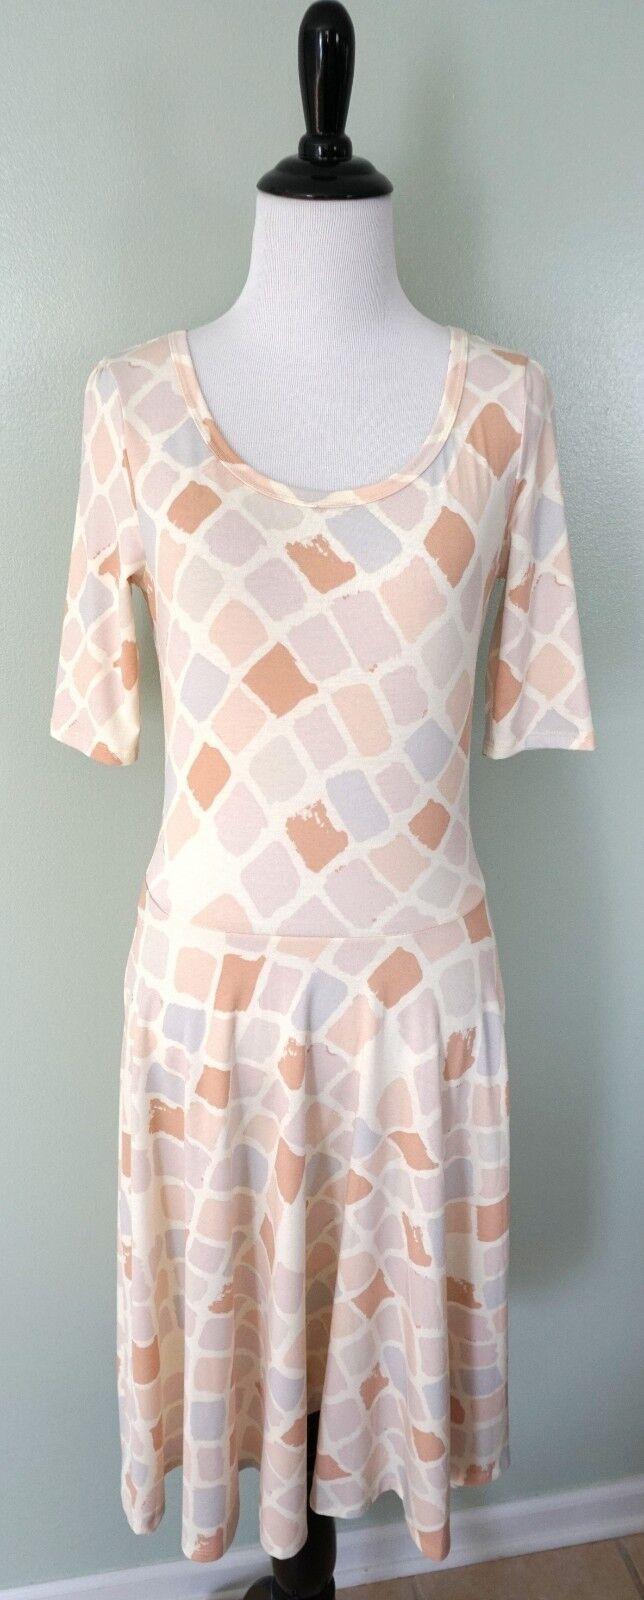 LULAROE Nicole White Pink bluee Scoop 3 4 Sleeve Party Flare Stretch Dress Size S